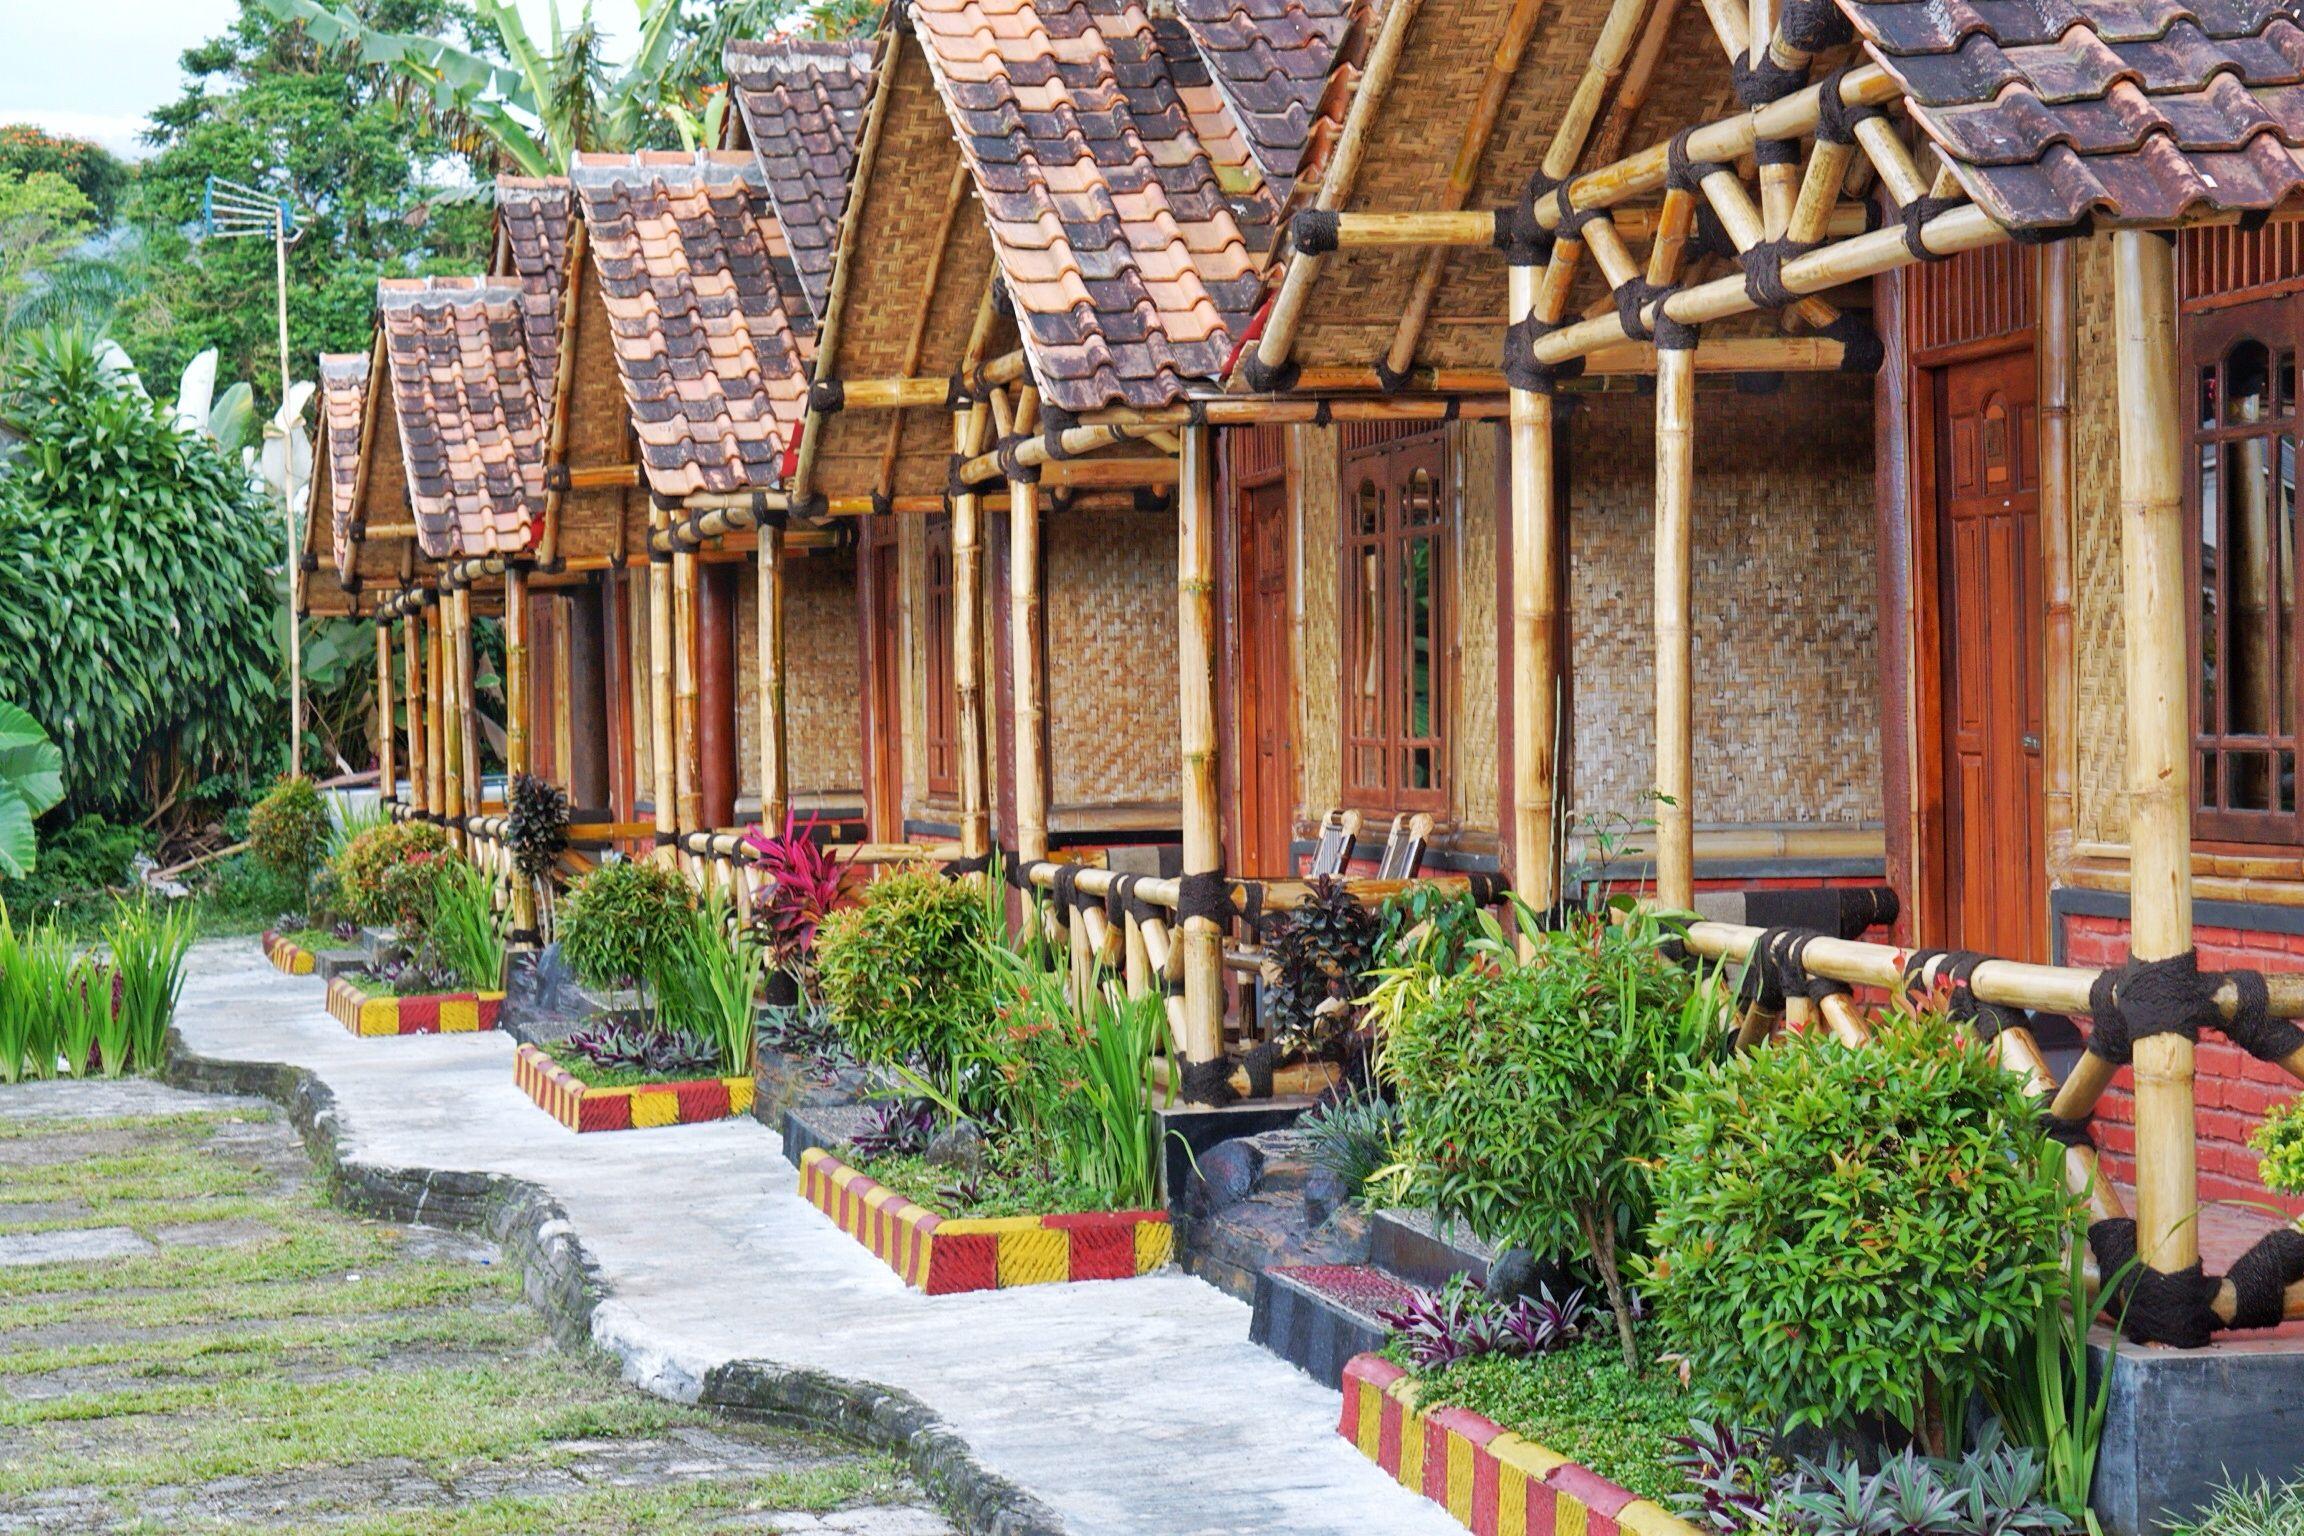 New Pesona Ksatria, Bogor